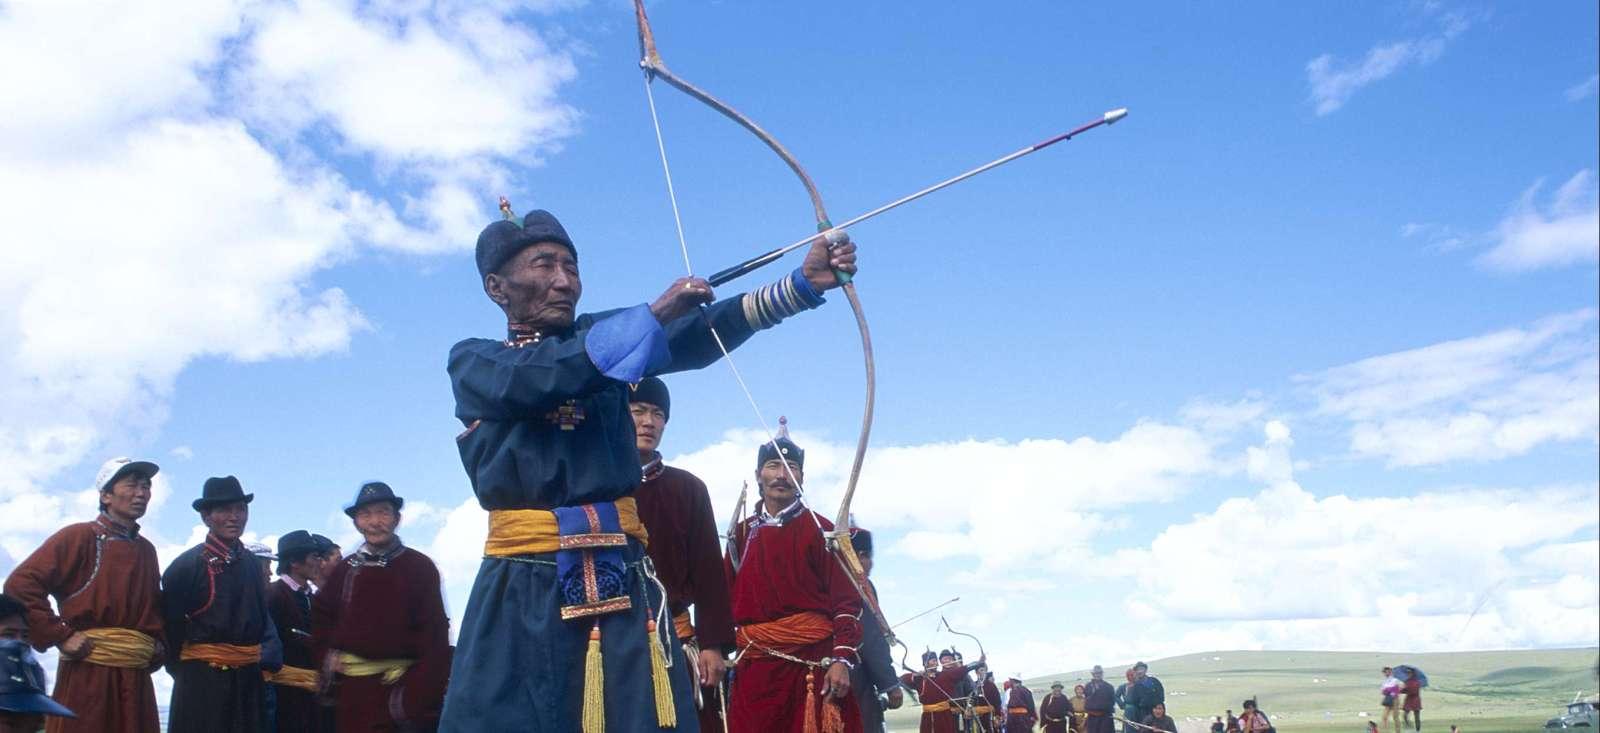 Voyage à pied : Festival de Naadam